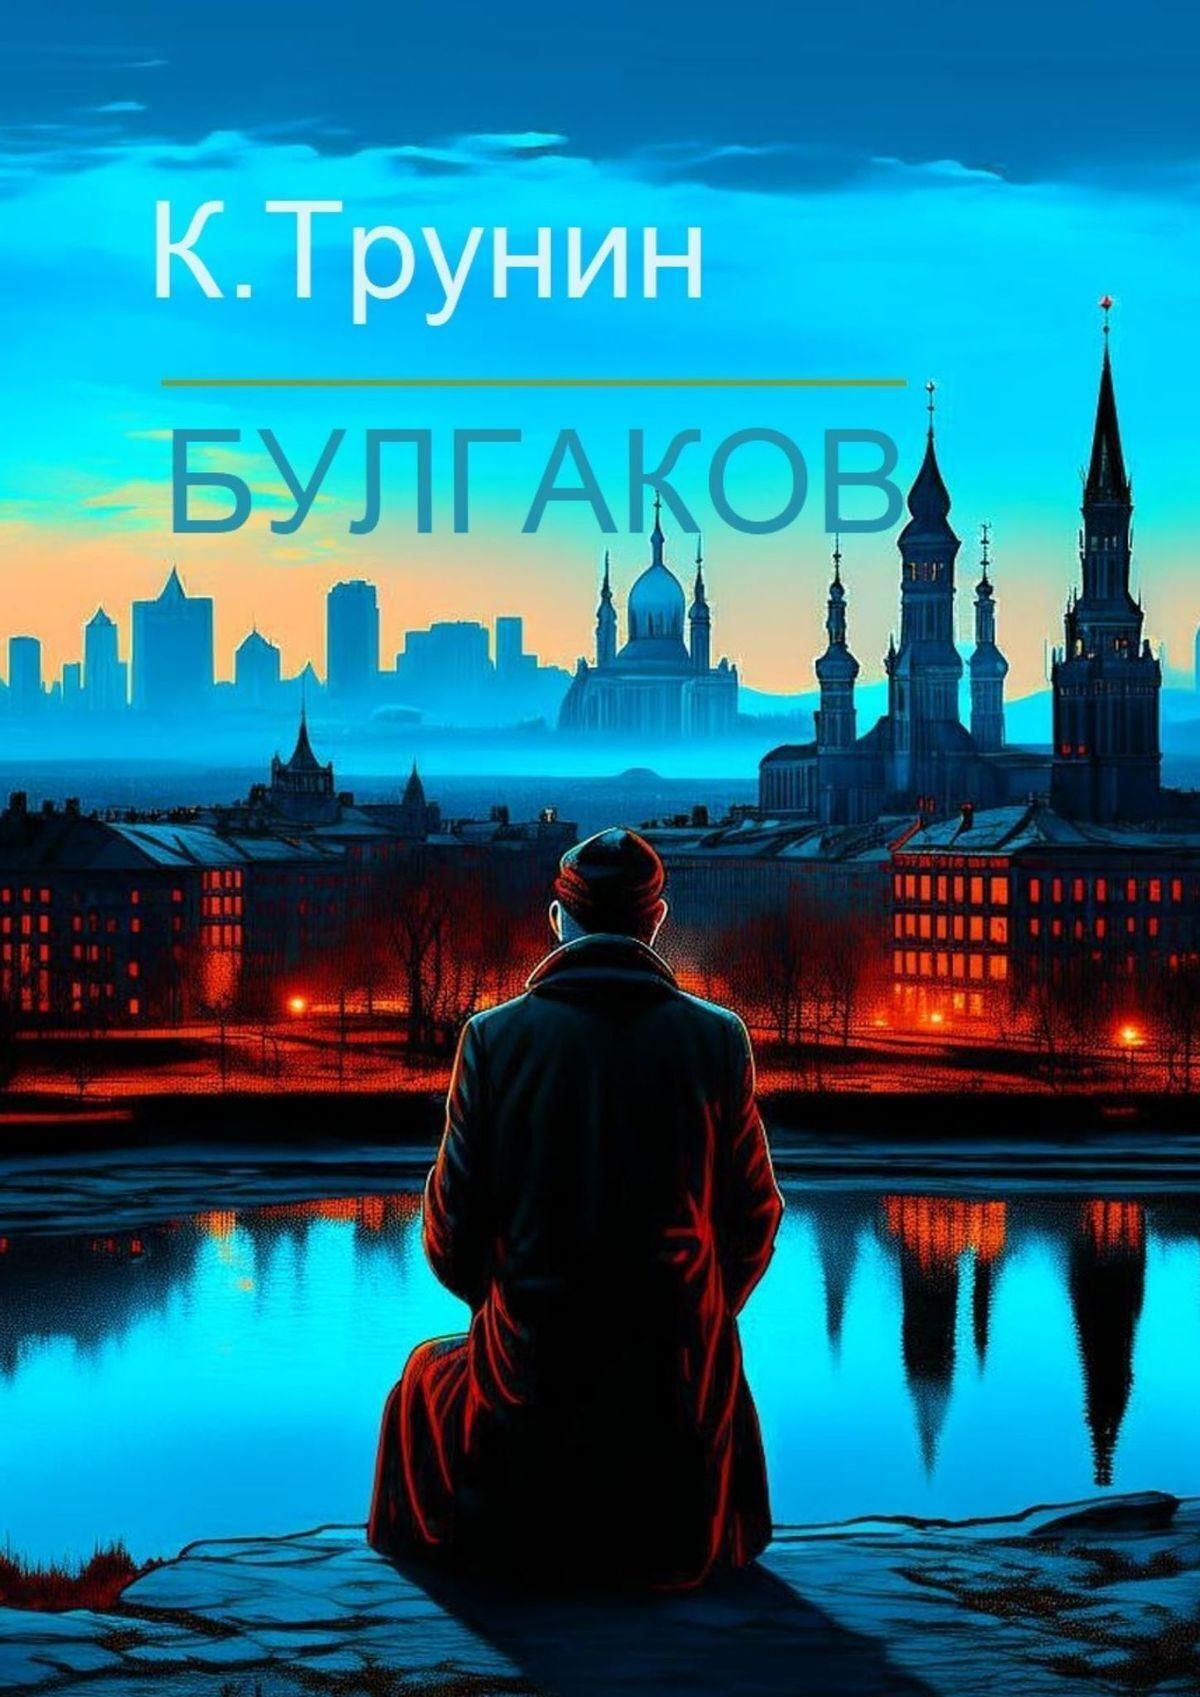 Книга М. Булгаков. Критика и анализ литературного наследия